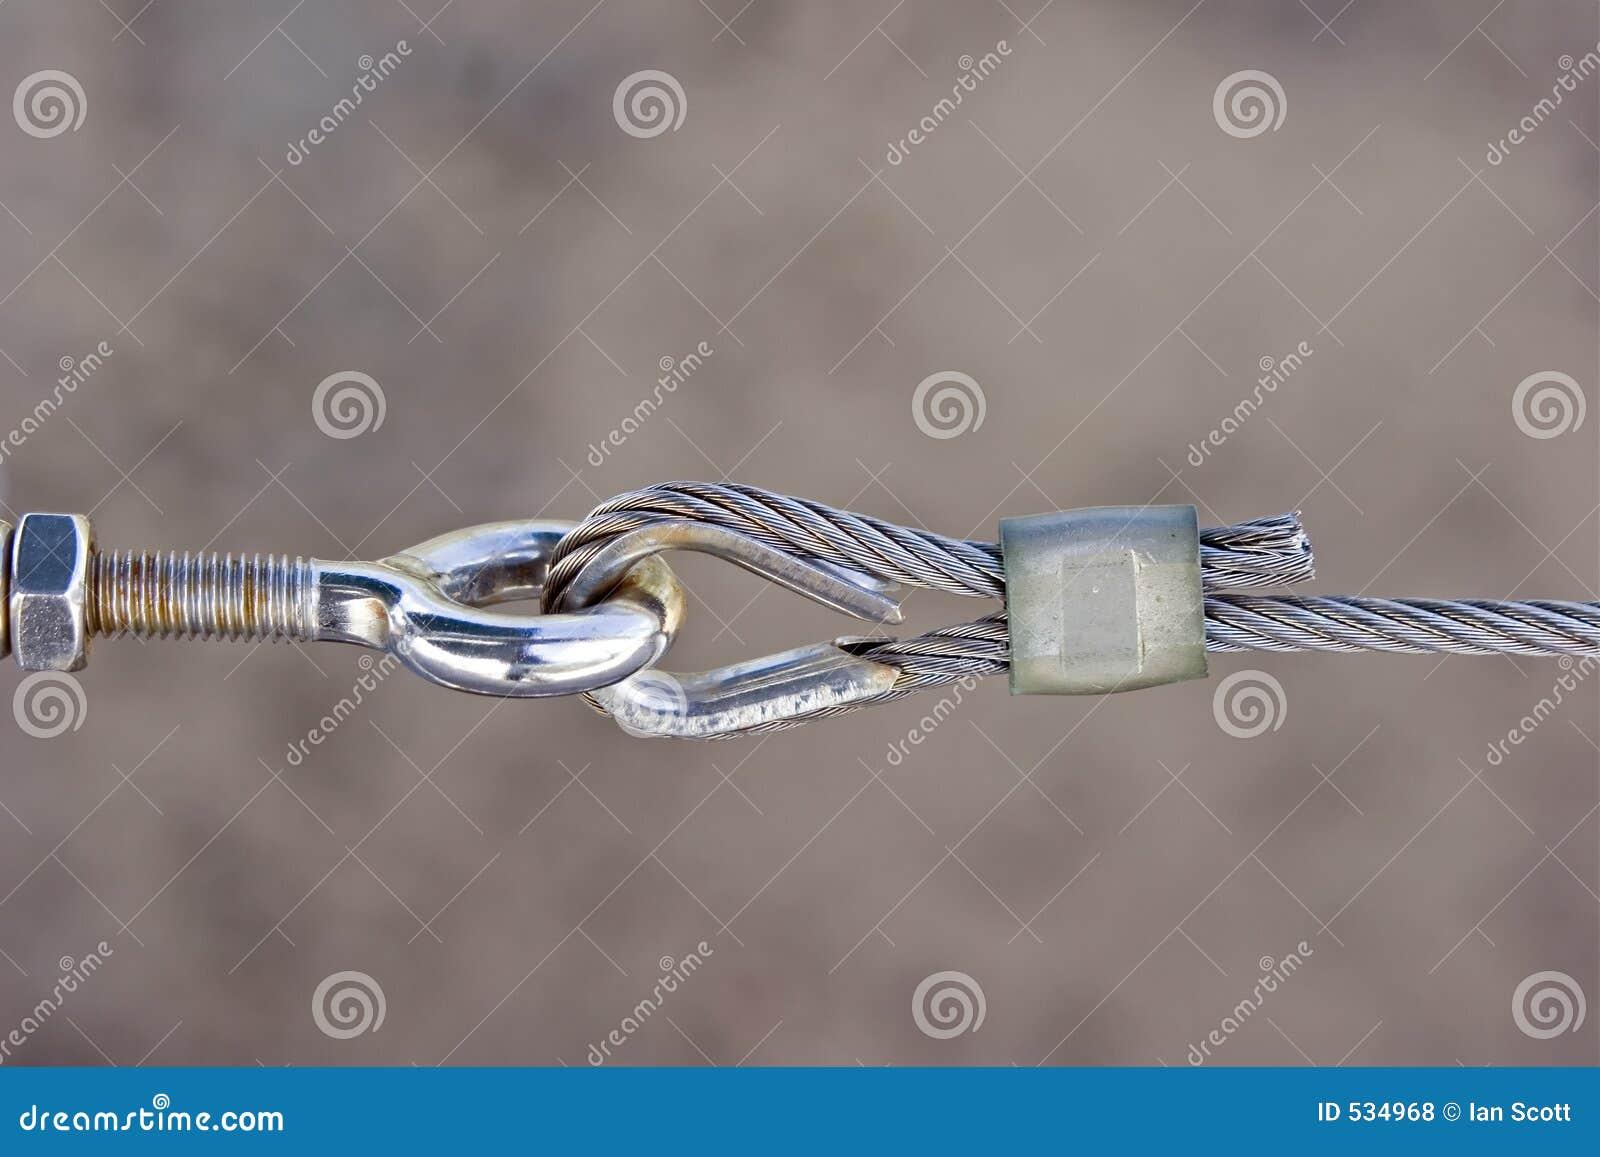 Download 手铐 库存照片. 图片 包括有 中断, 铁锈, 电缆, 线程数, 发光, 螺母, 螺丝, 金属, 镀铬物, 穿线 - 534968